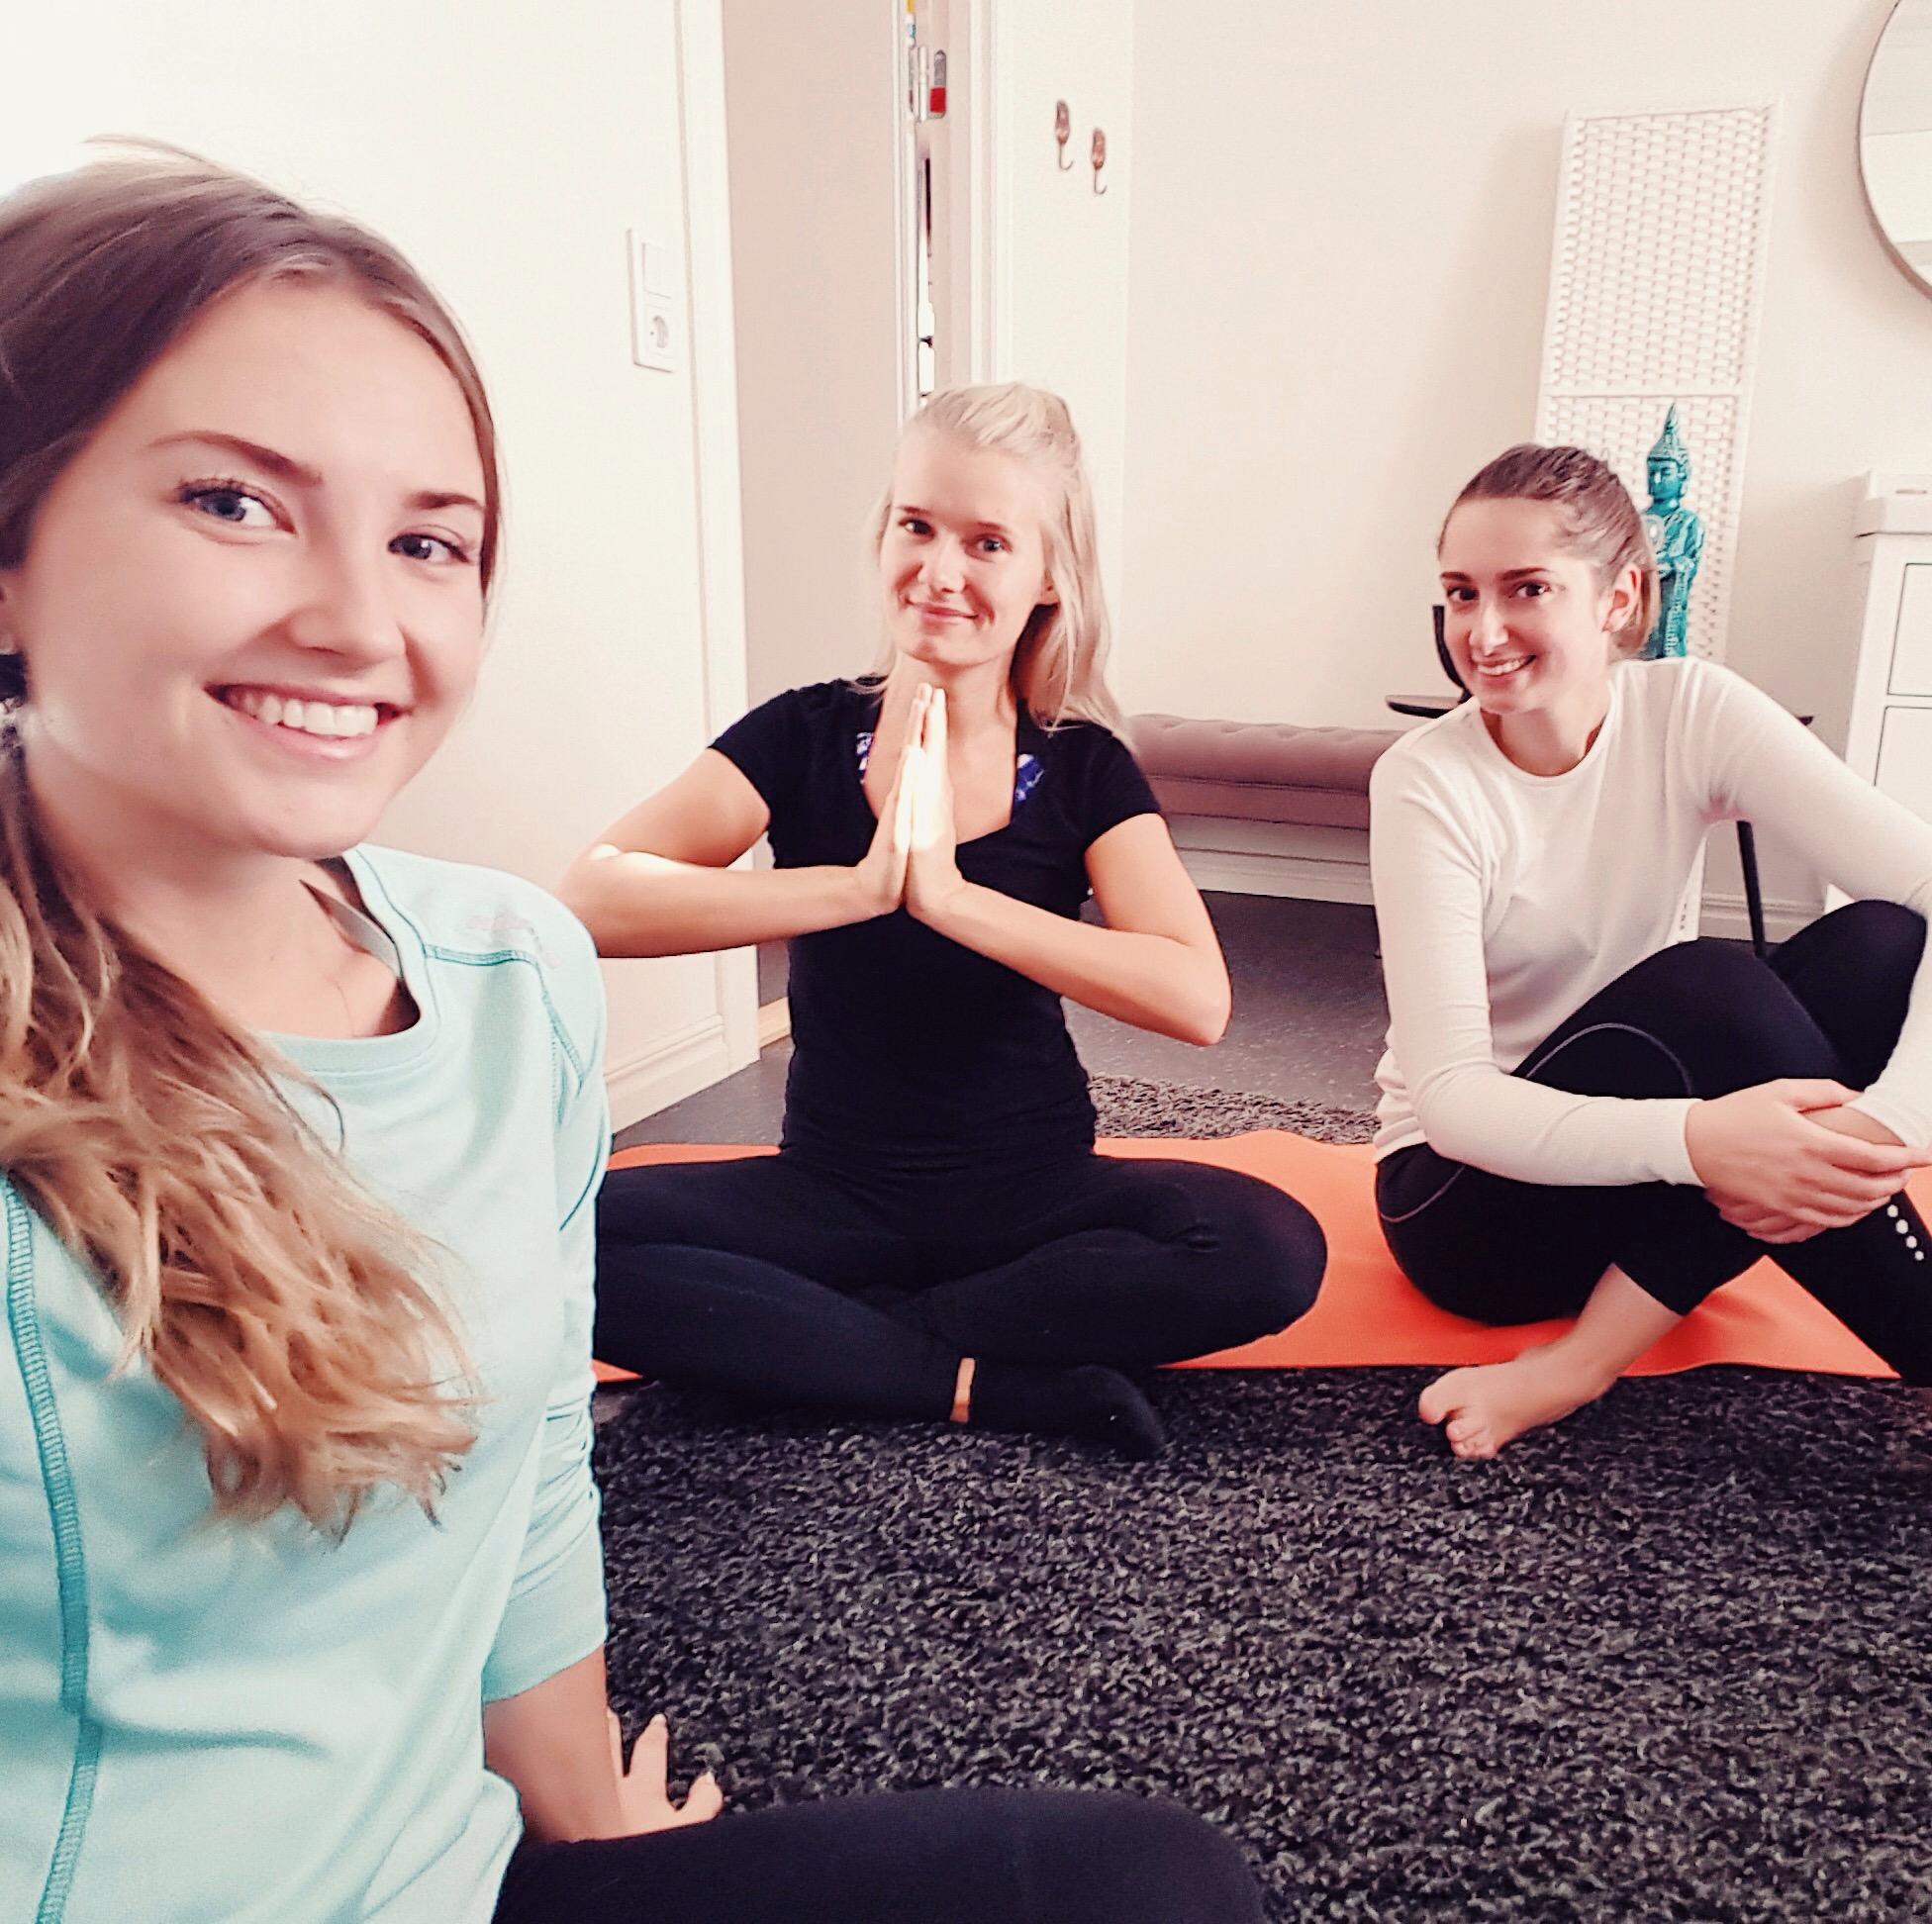 yoga innan jobbet - Piggabutiken